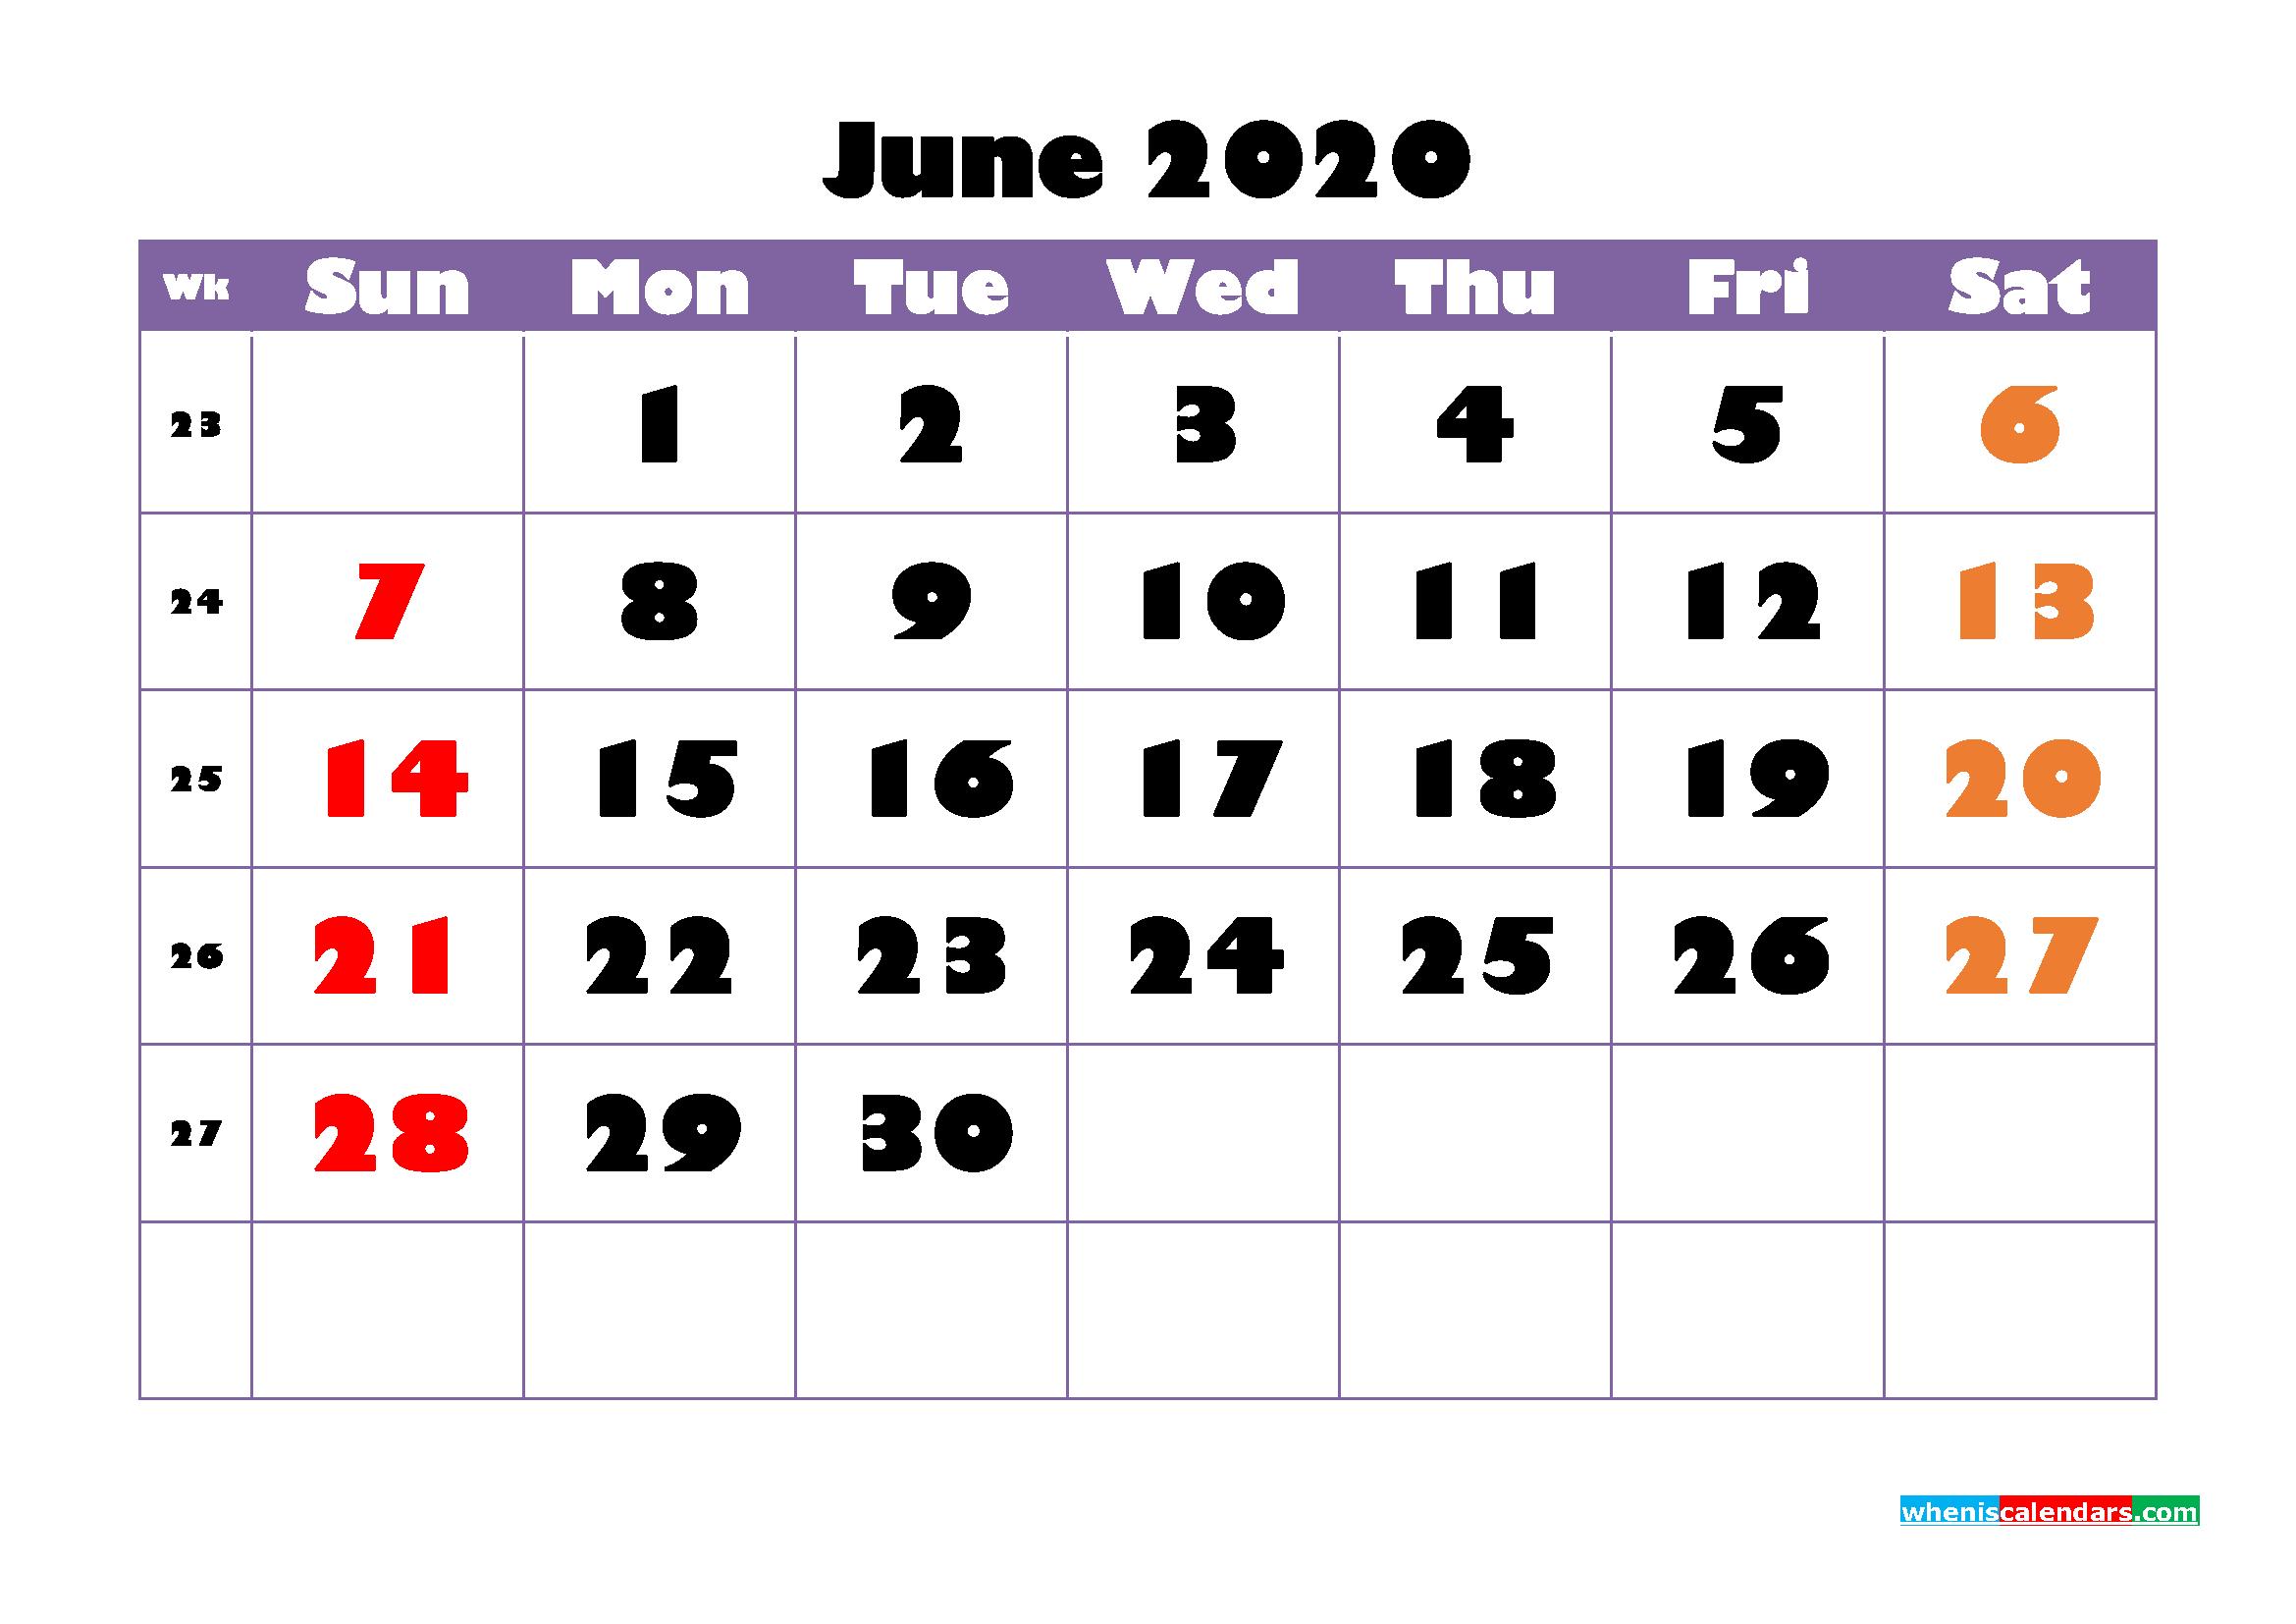 Free Printable June 2020 Calendar - No.m20b750